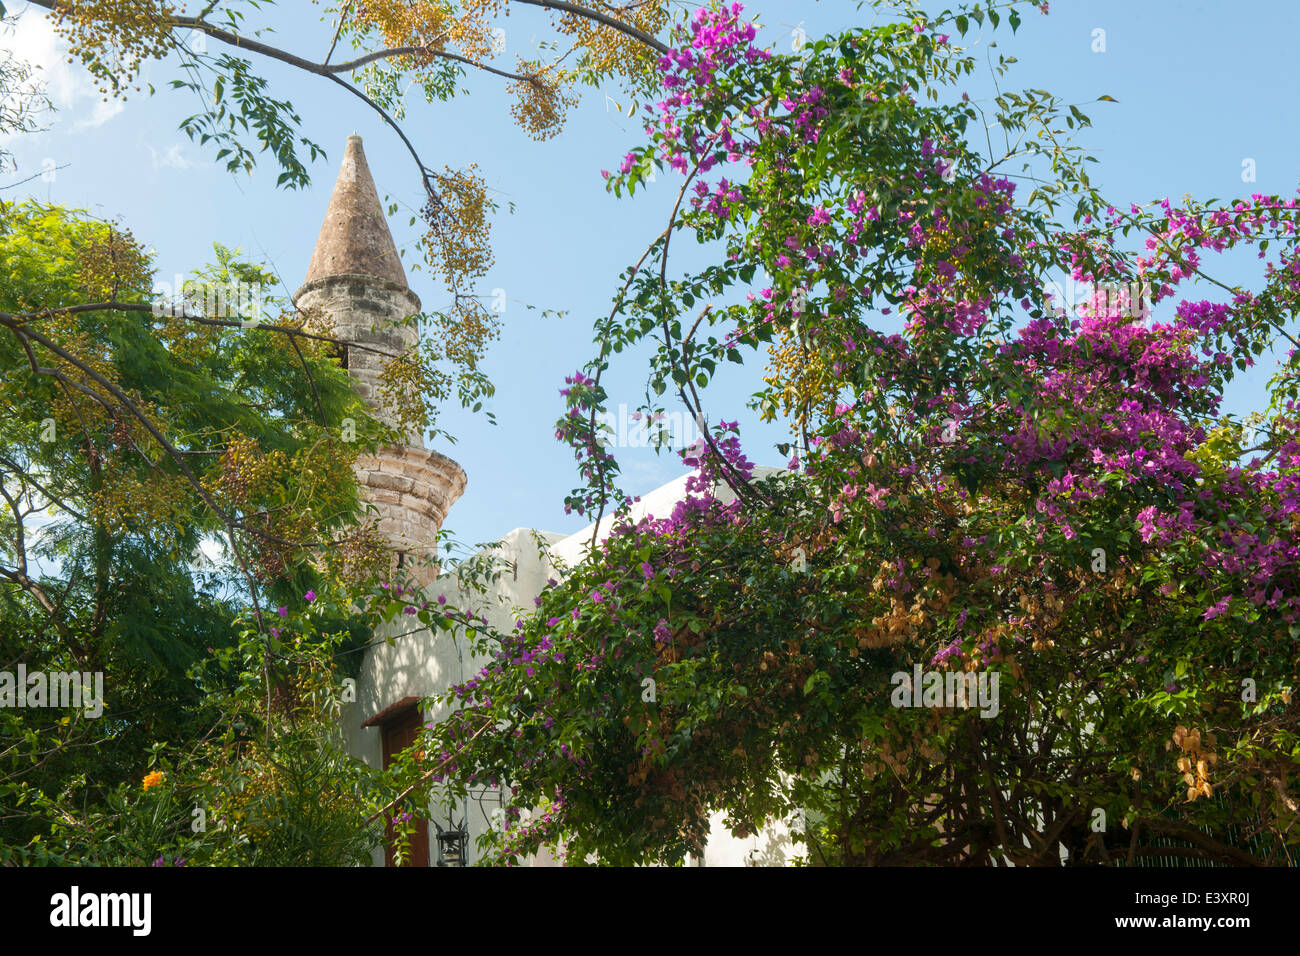 Griechenland, Rhodos-Stadt, Altstadt, Platia Athina, Agios Spiridion (Kavakli-Moschee) - Stock Image